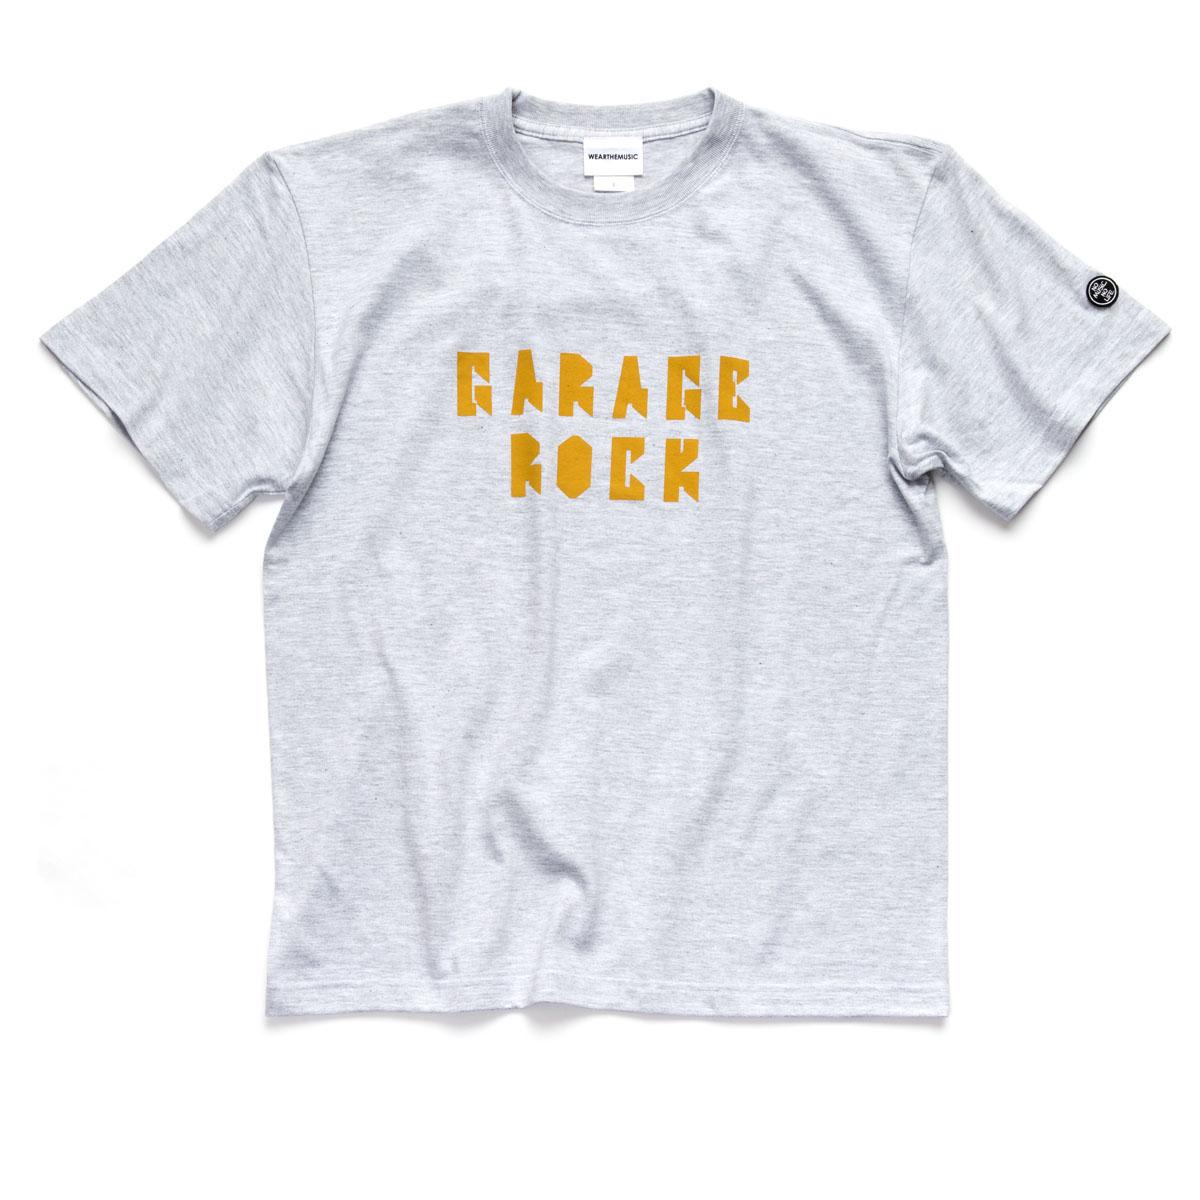 WTM_ジャンルT-Shirts GARAGE ROCK アッシュ